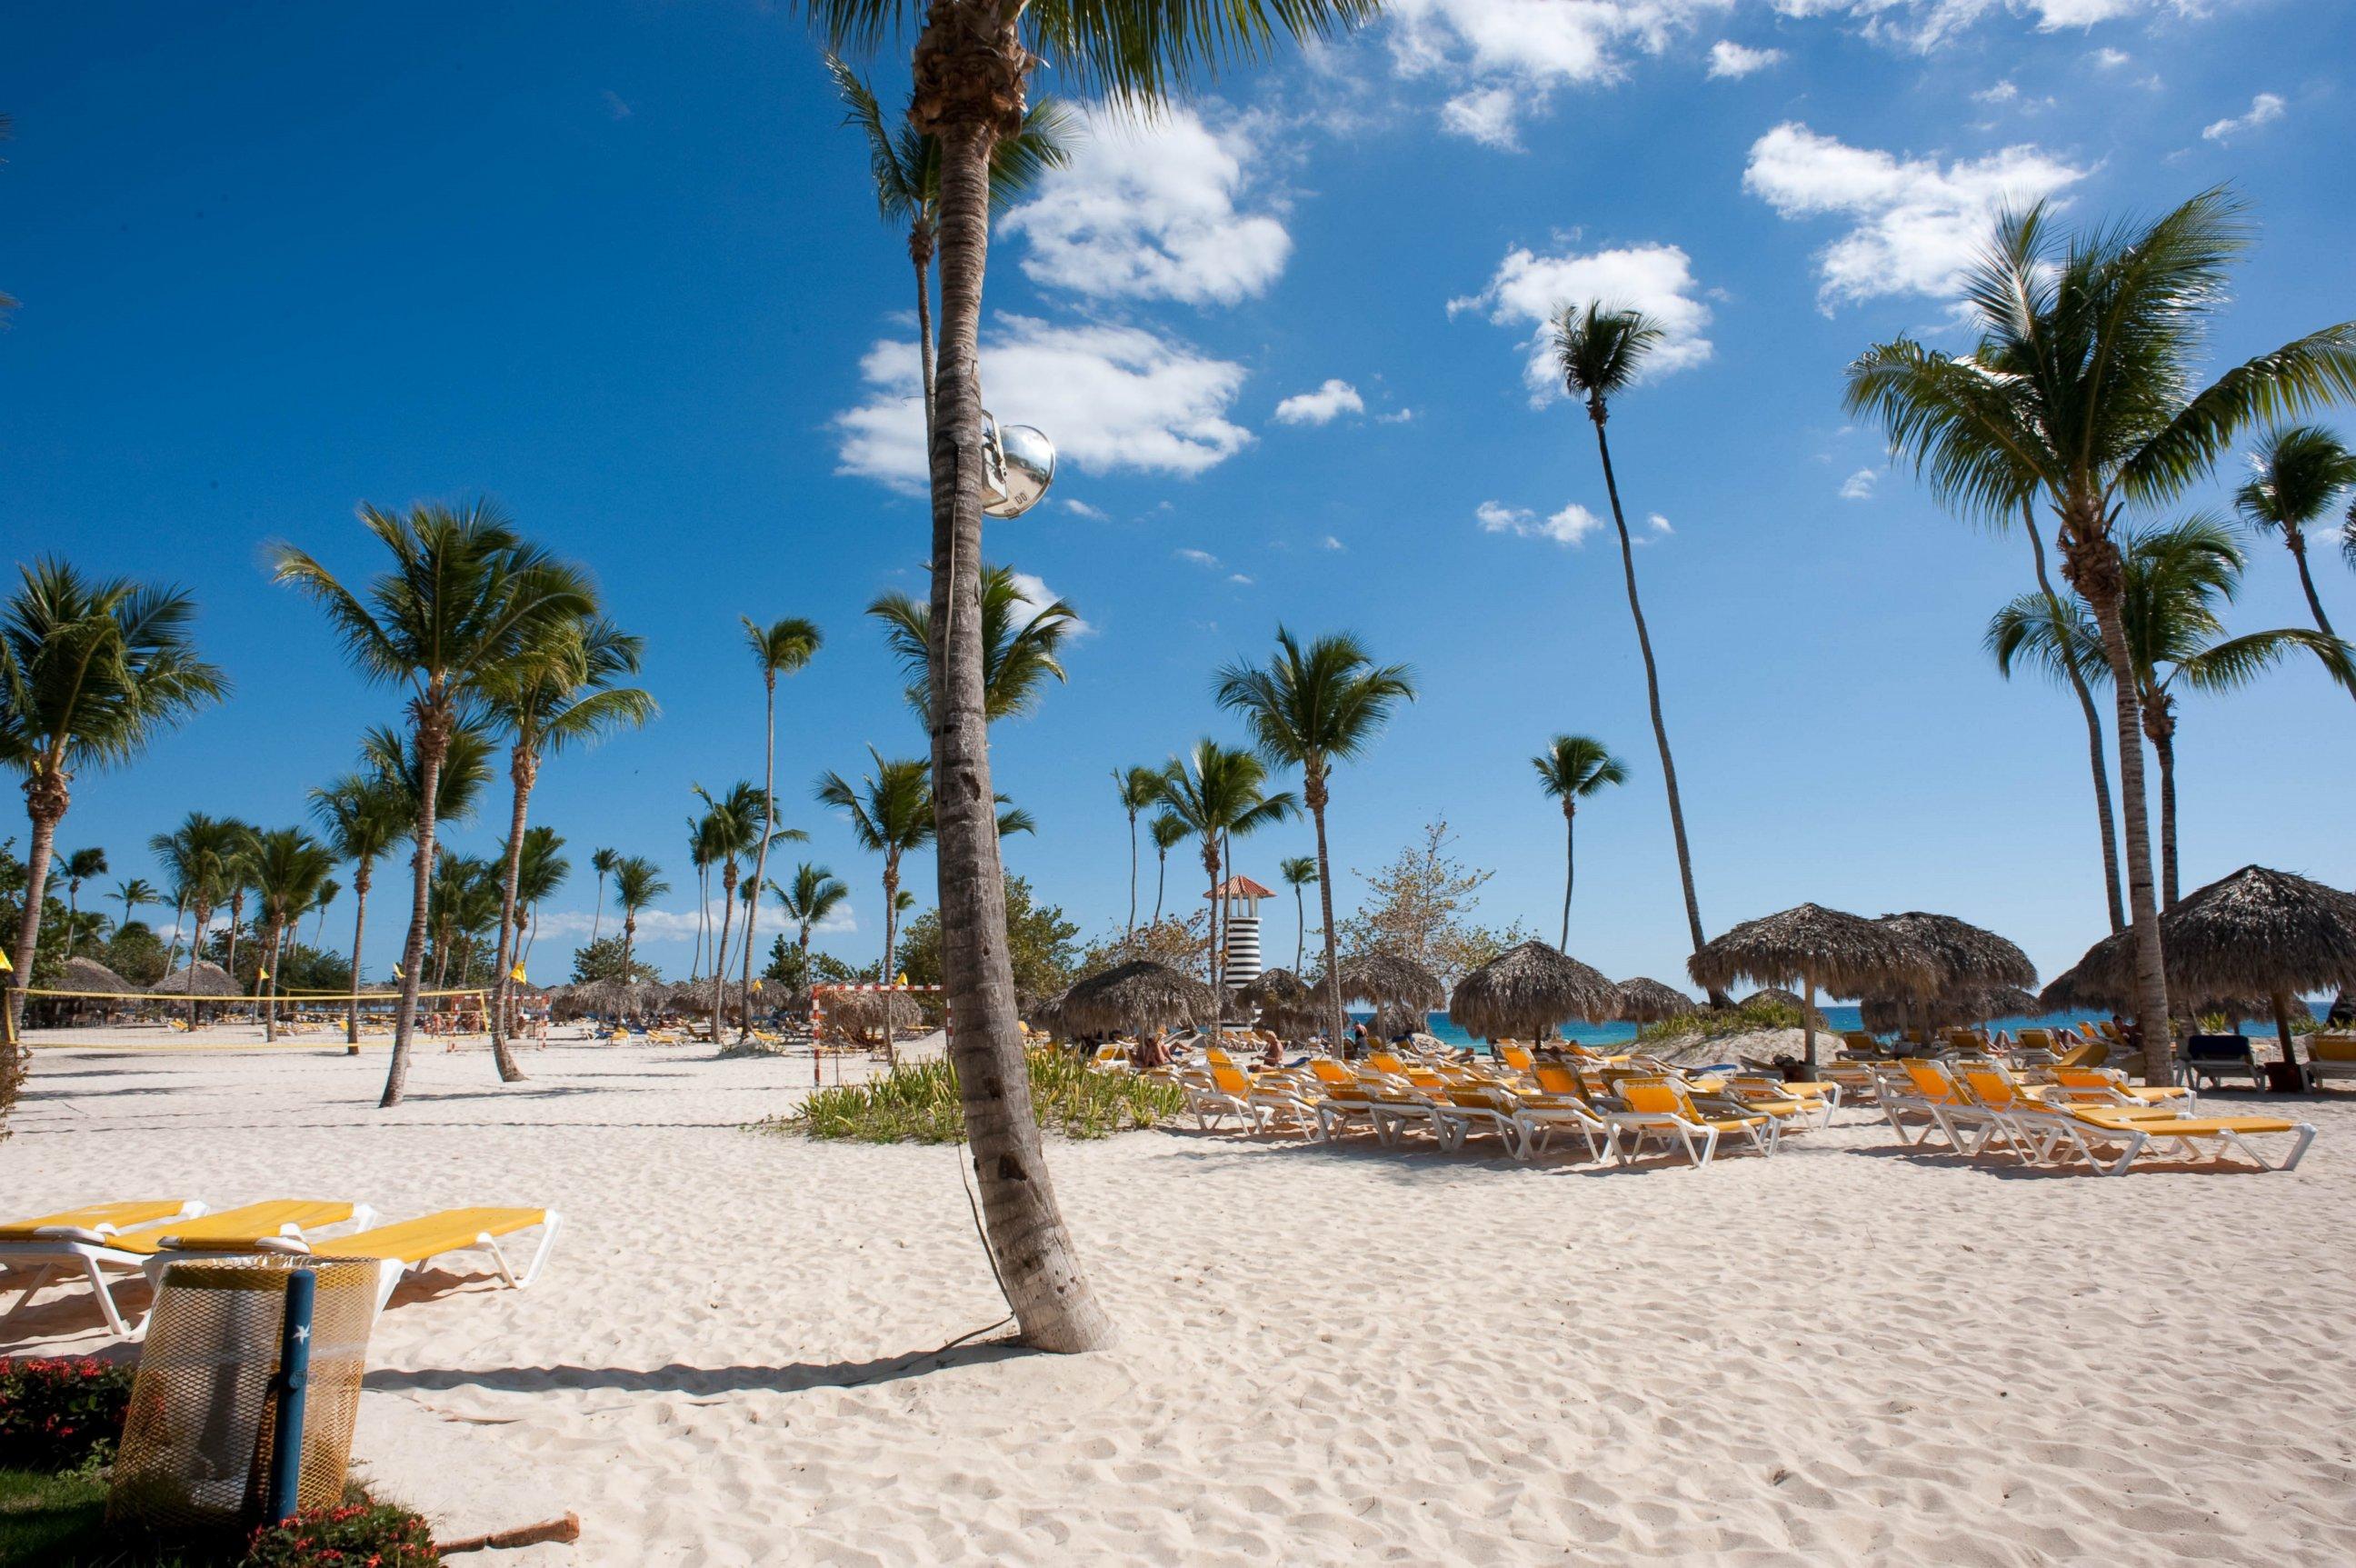 TripAdvisors Top 10 All-Inclusive Caribbean Resorts